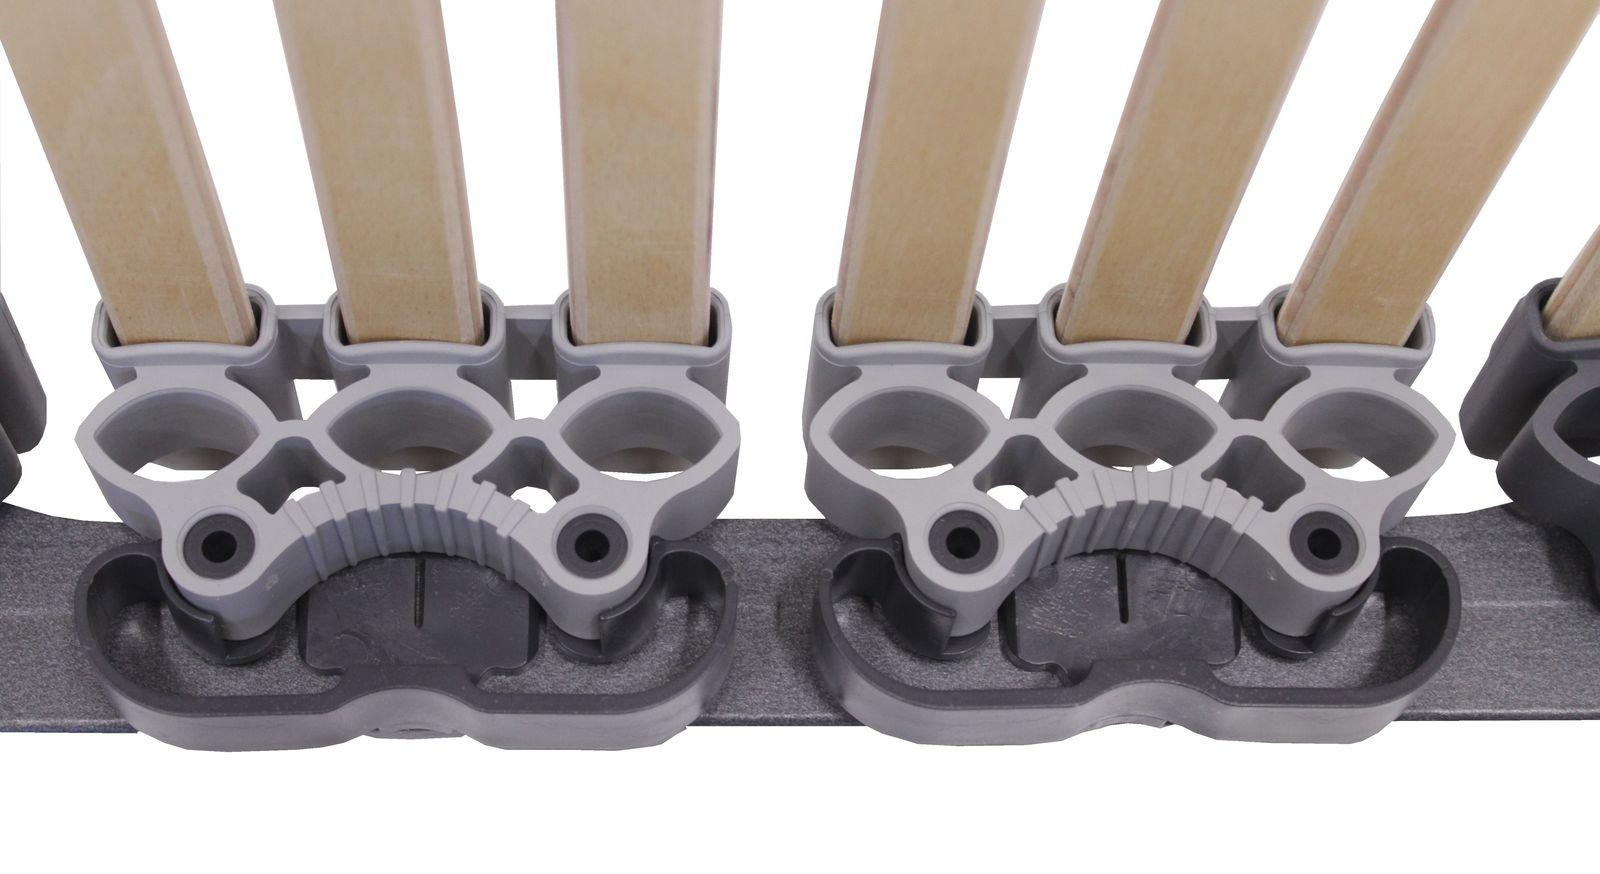 Lattenrost orthowell ultraflex mit flexiblen Trio-Kappen